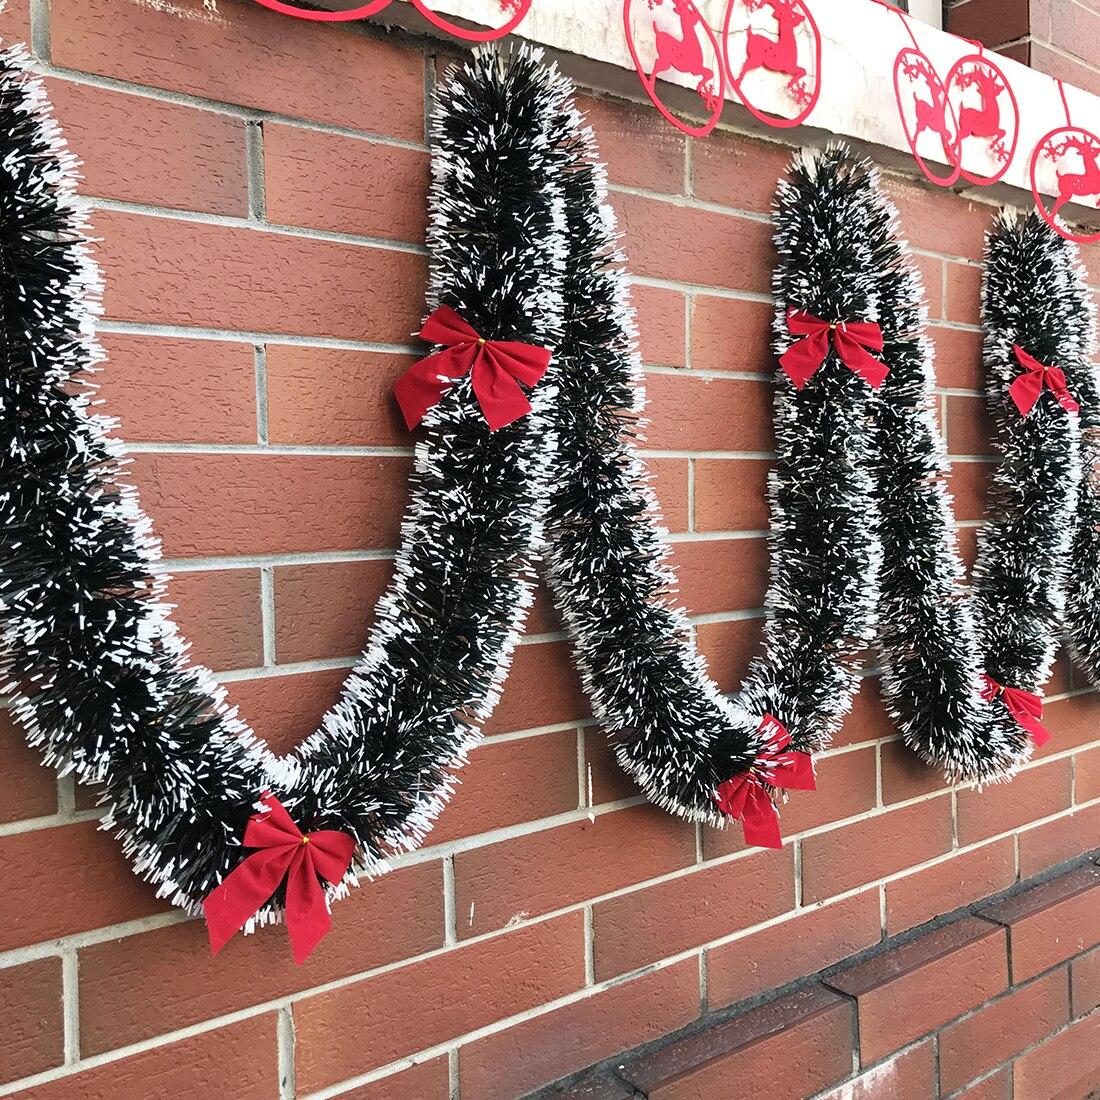 2M Christmas Garland Decoration Bar Tops Ribbon Christmas Tree Ornaments White Dark Green Cane Tinsel Party Supplies